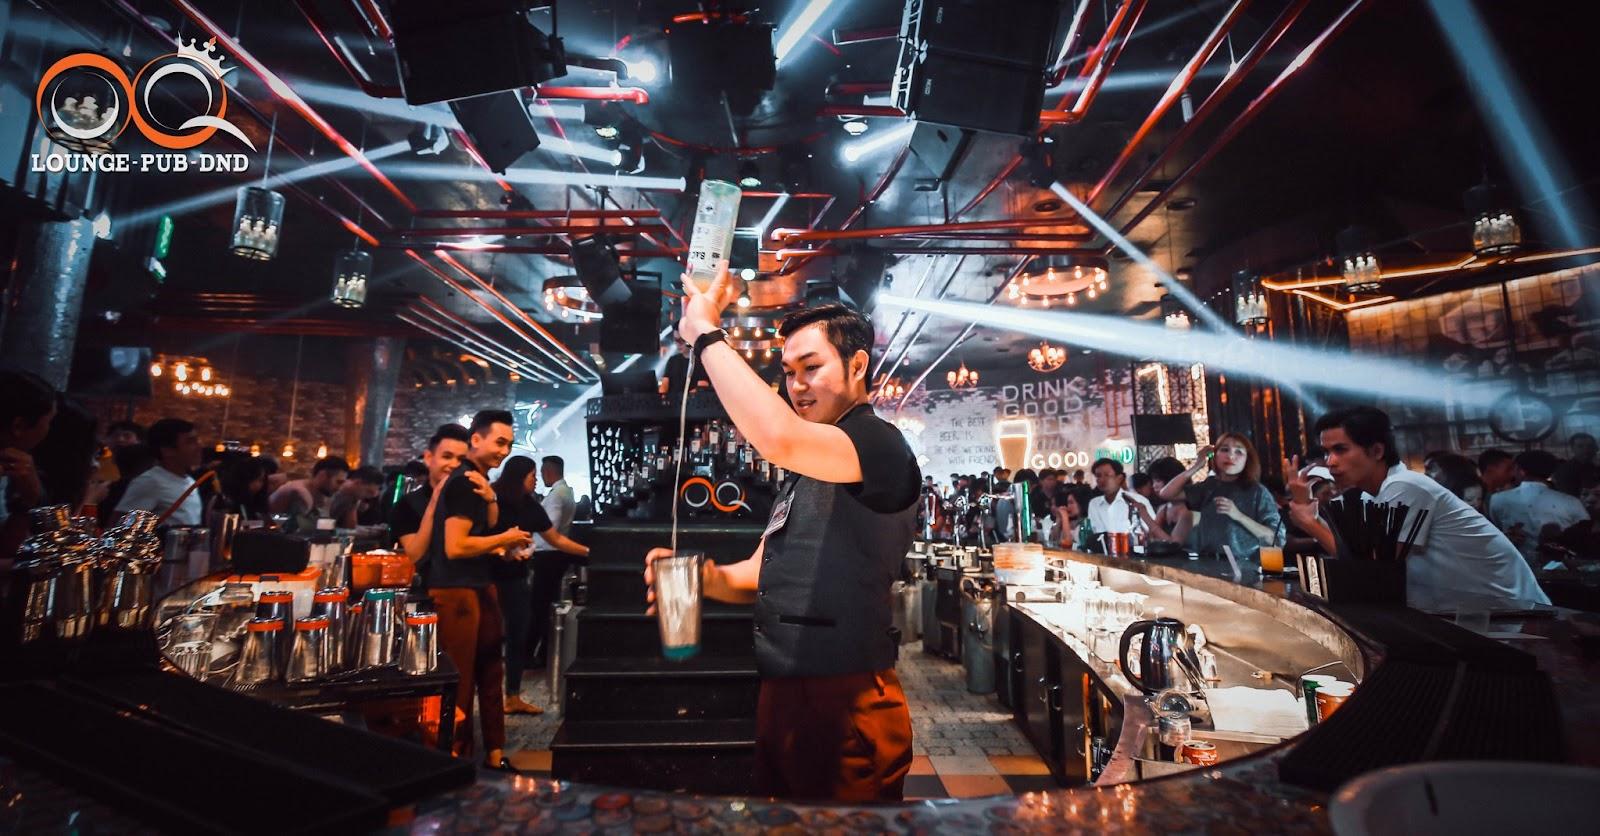 OQ Lounge Pub DnD Danang